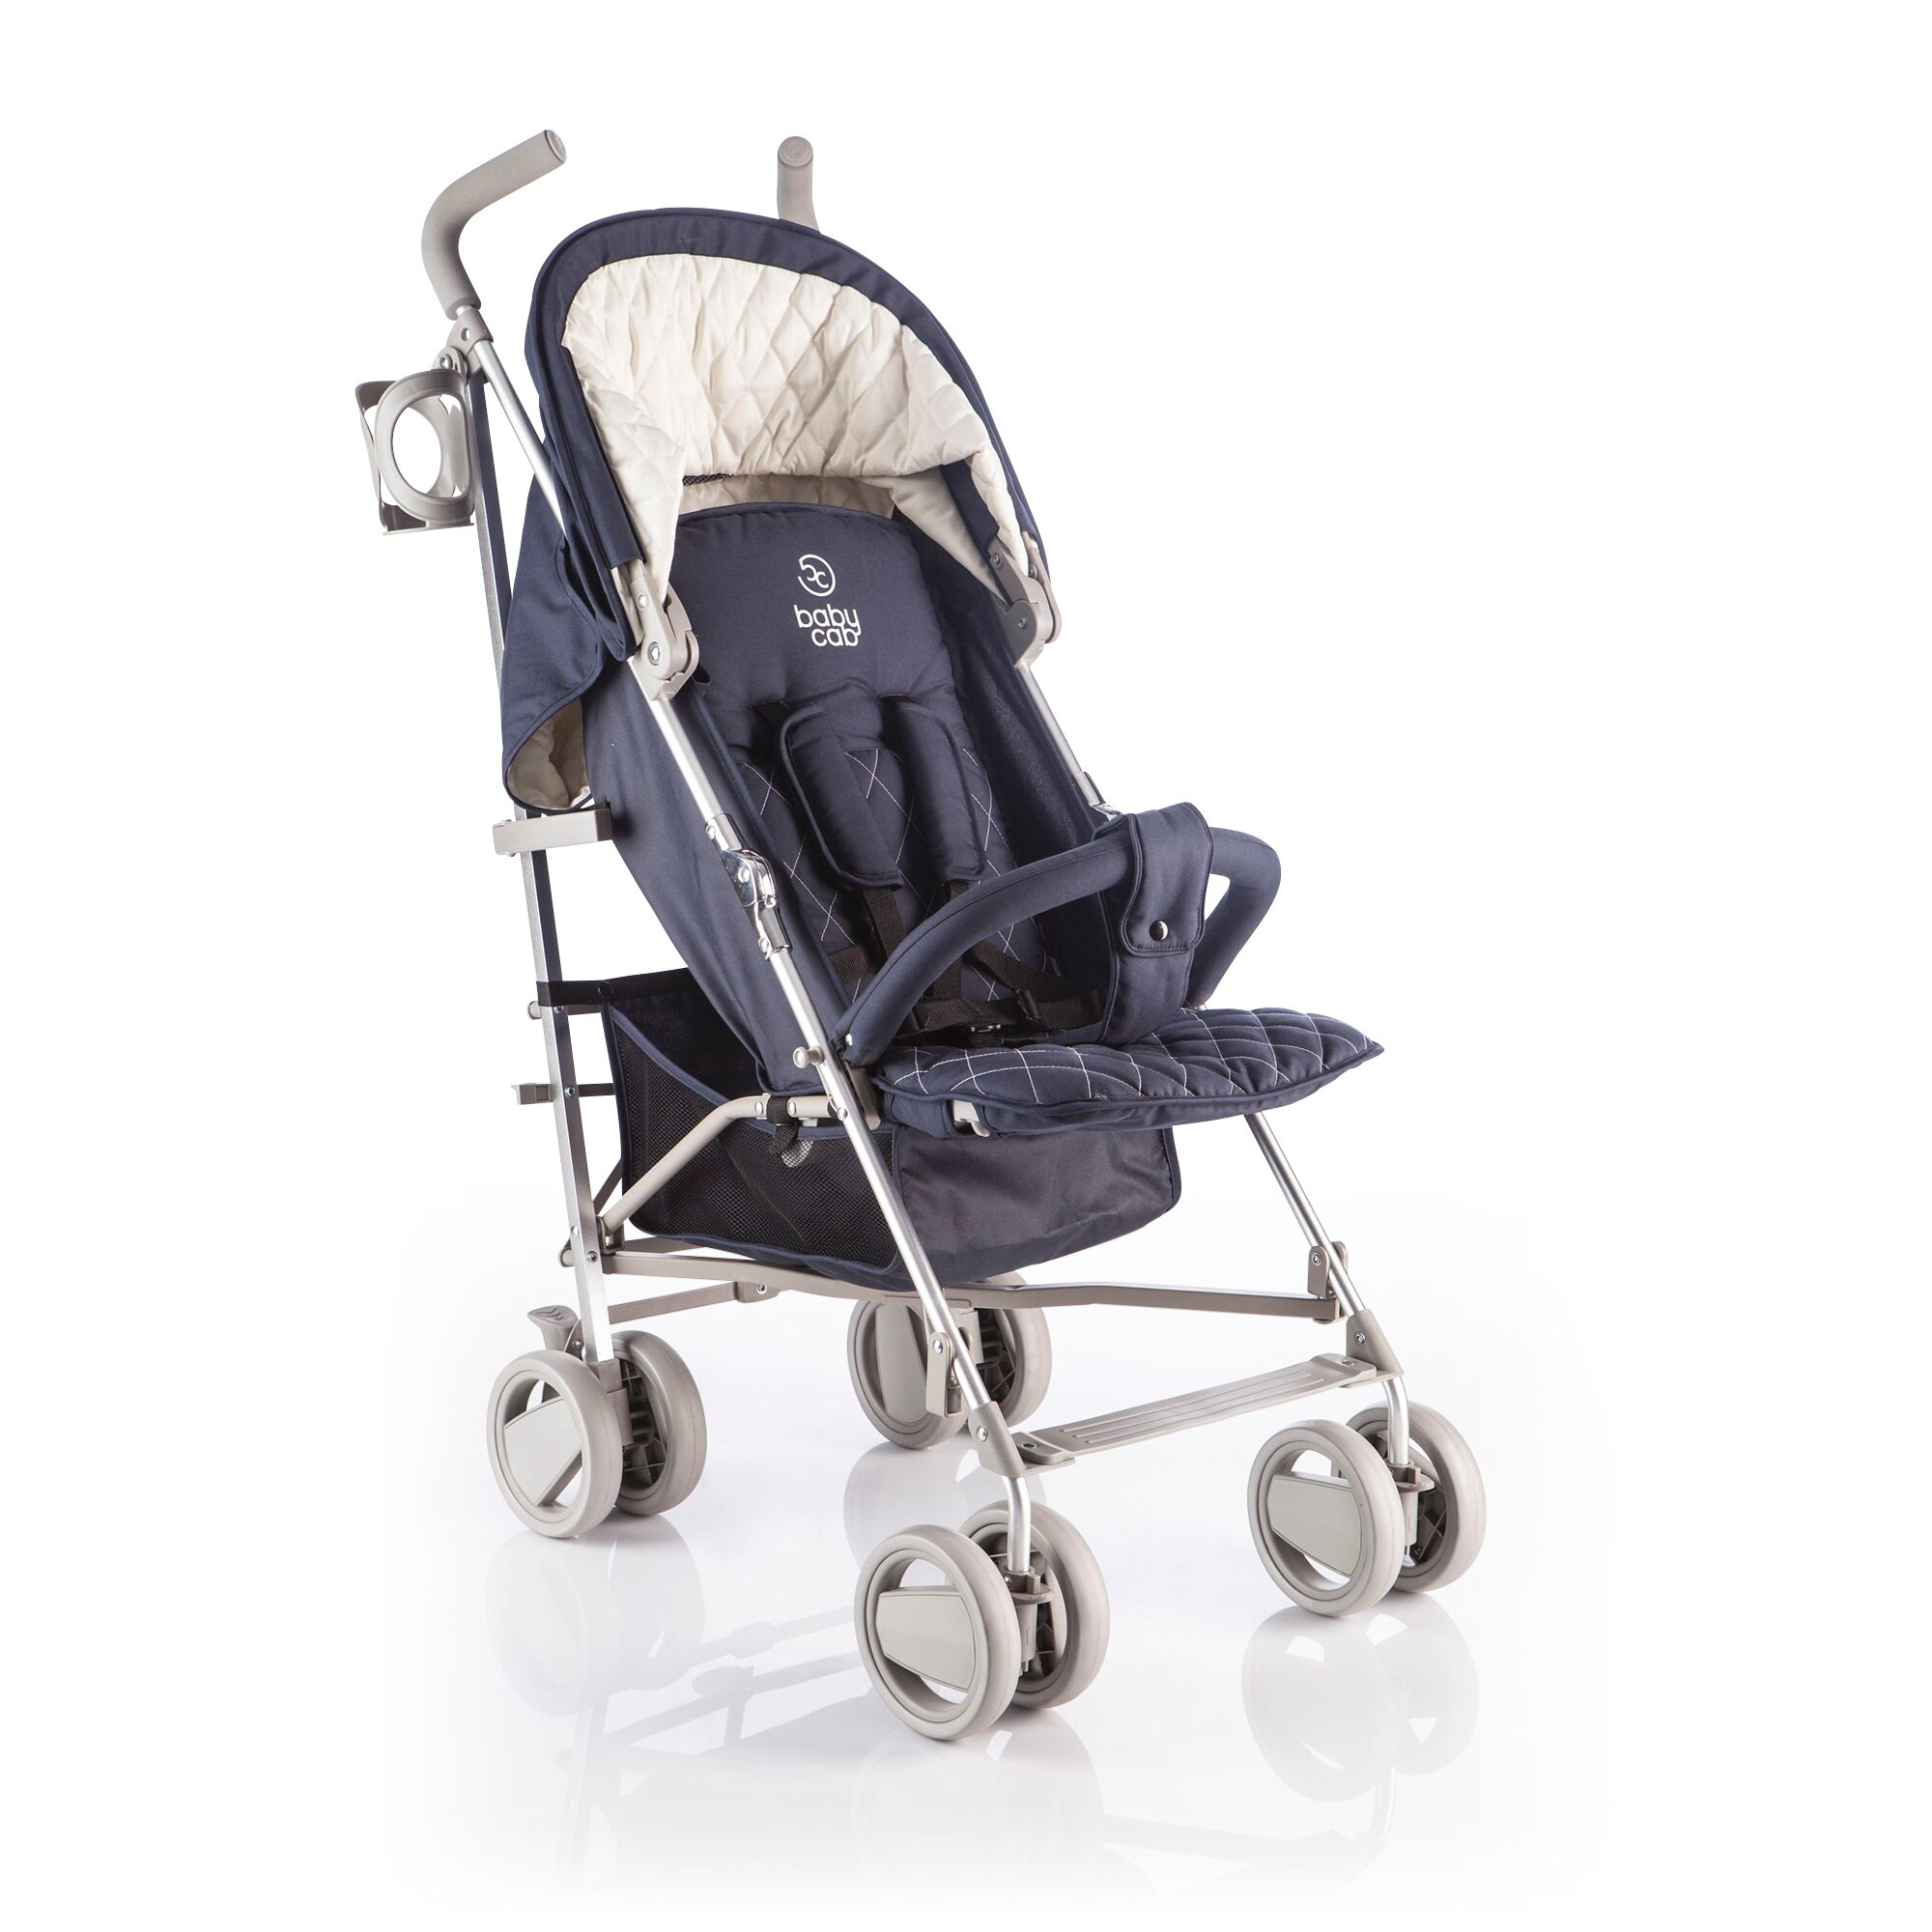 babycab-david-buggy-mit-liegefunktion-blau